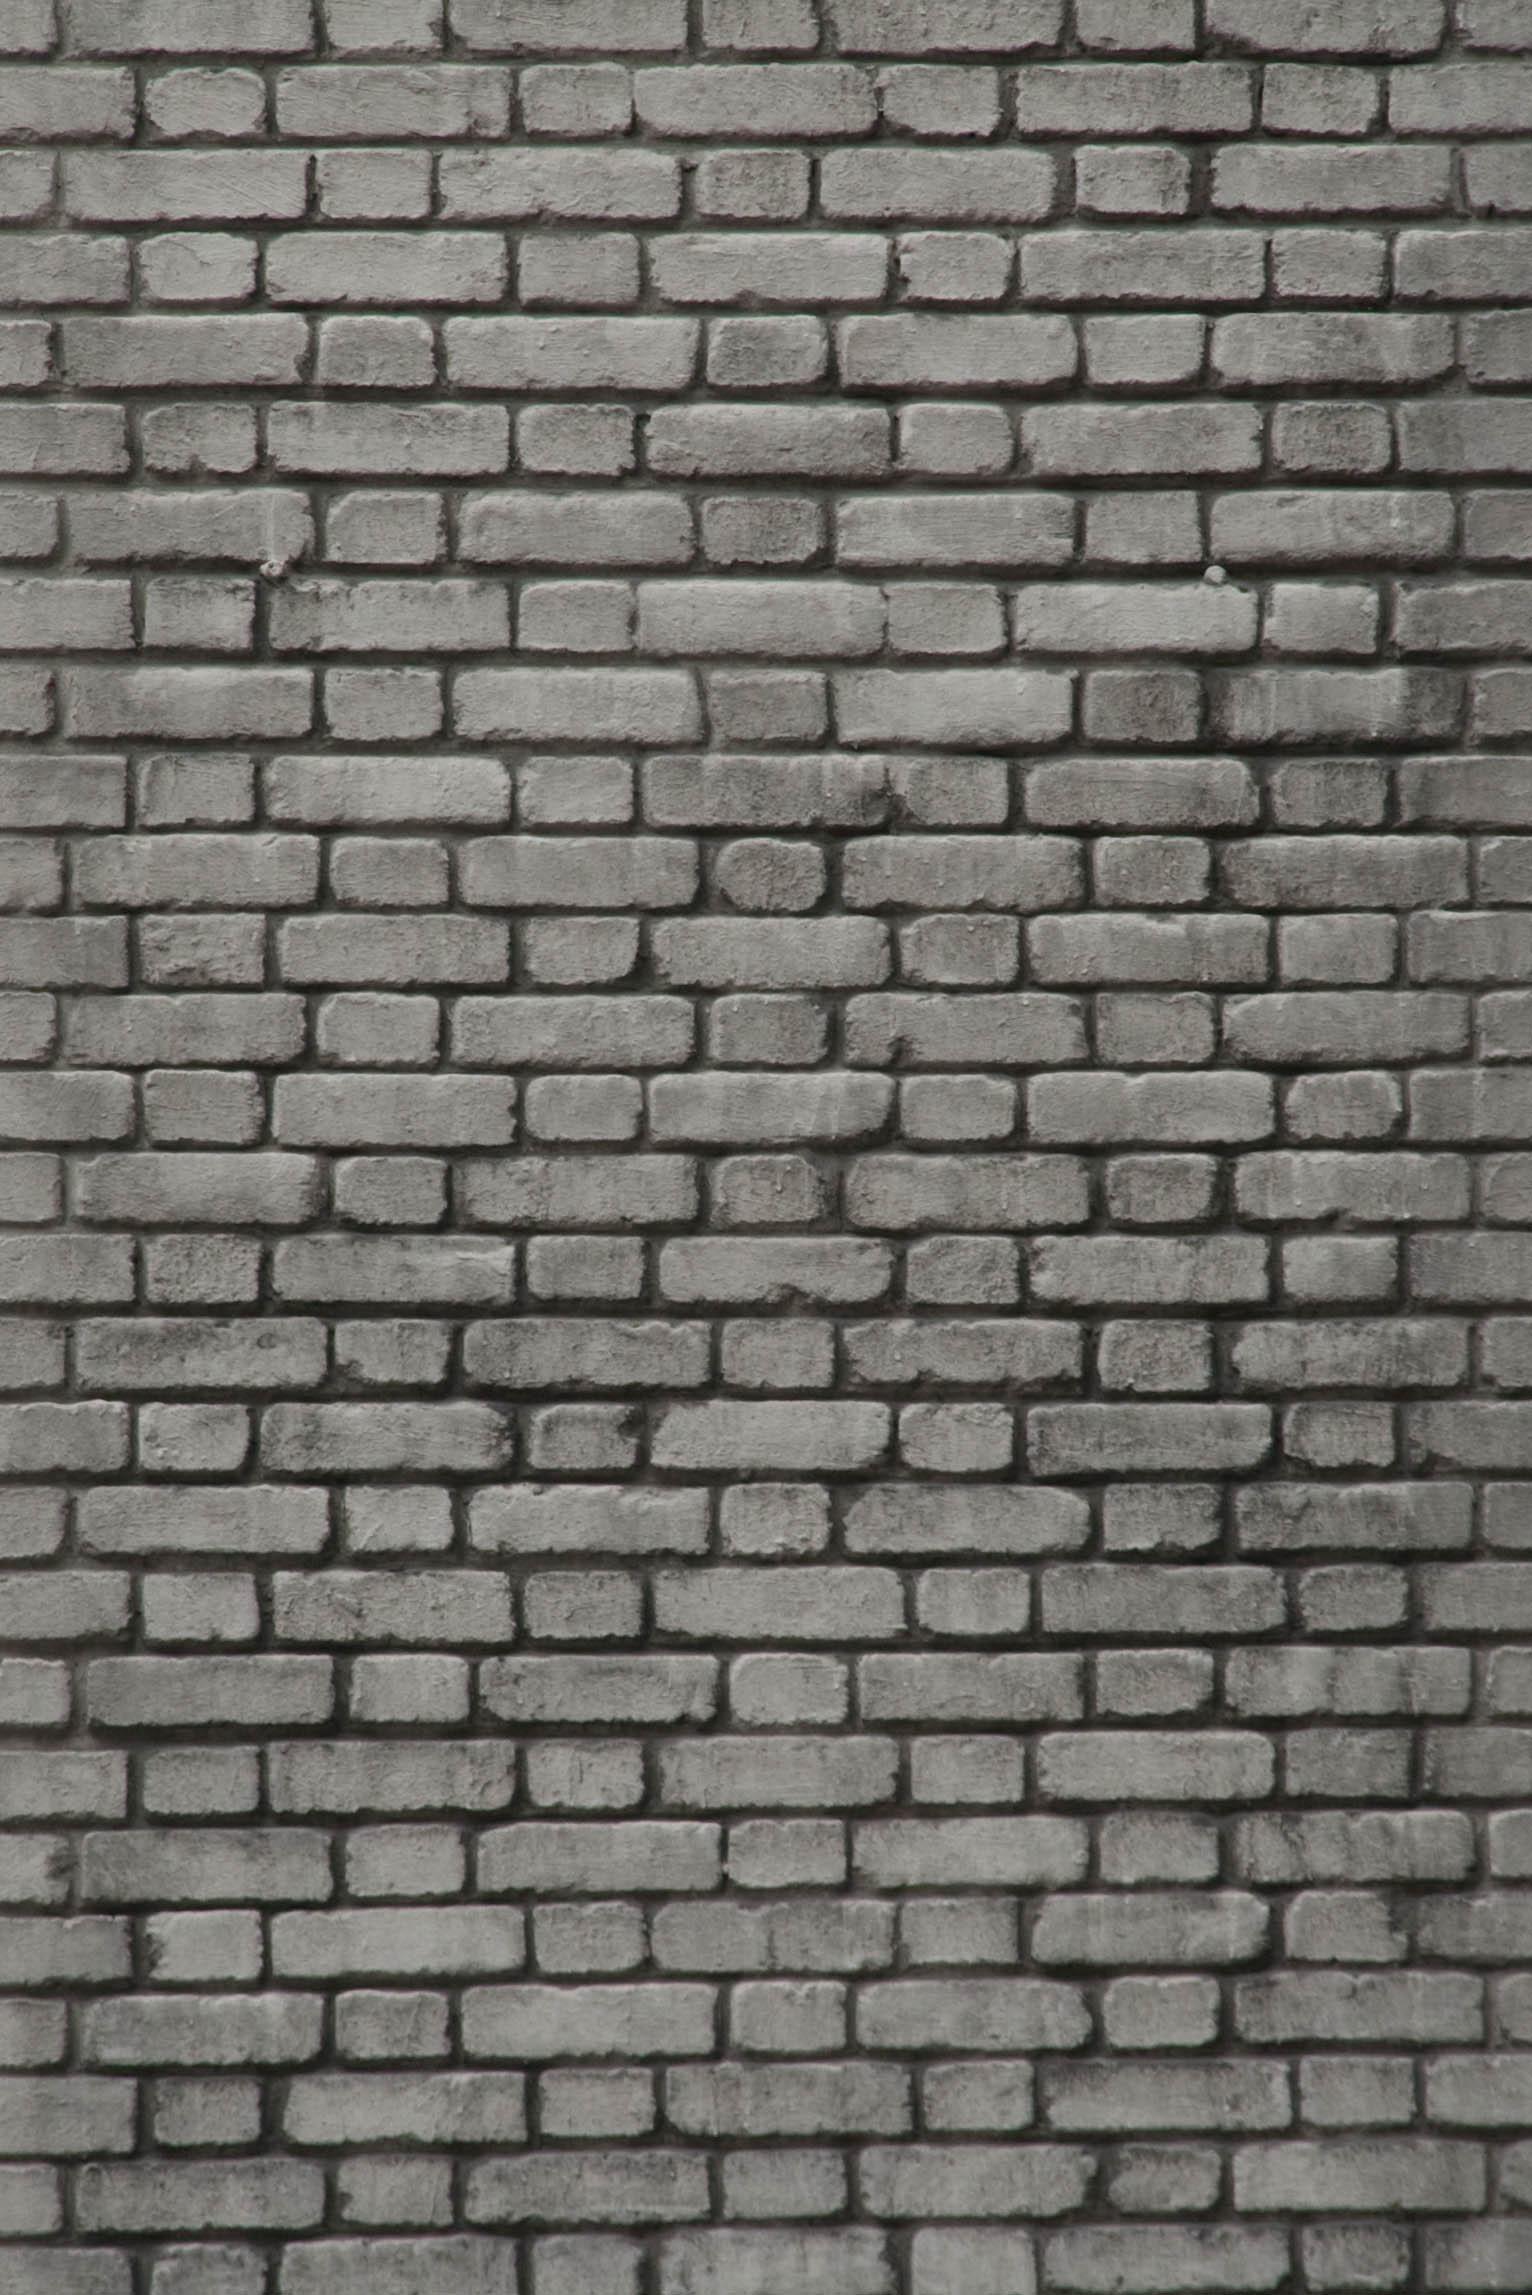 стена, кирпичи, текстура, фон, скачать